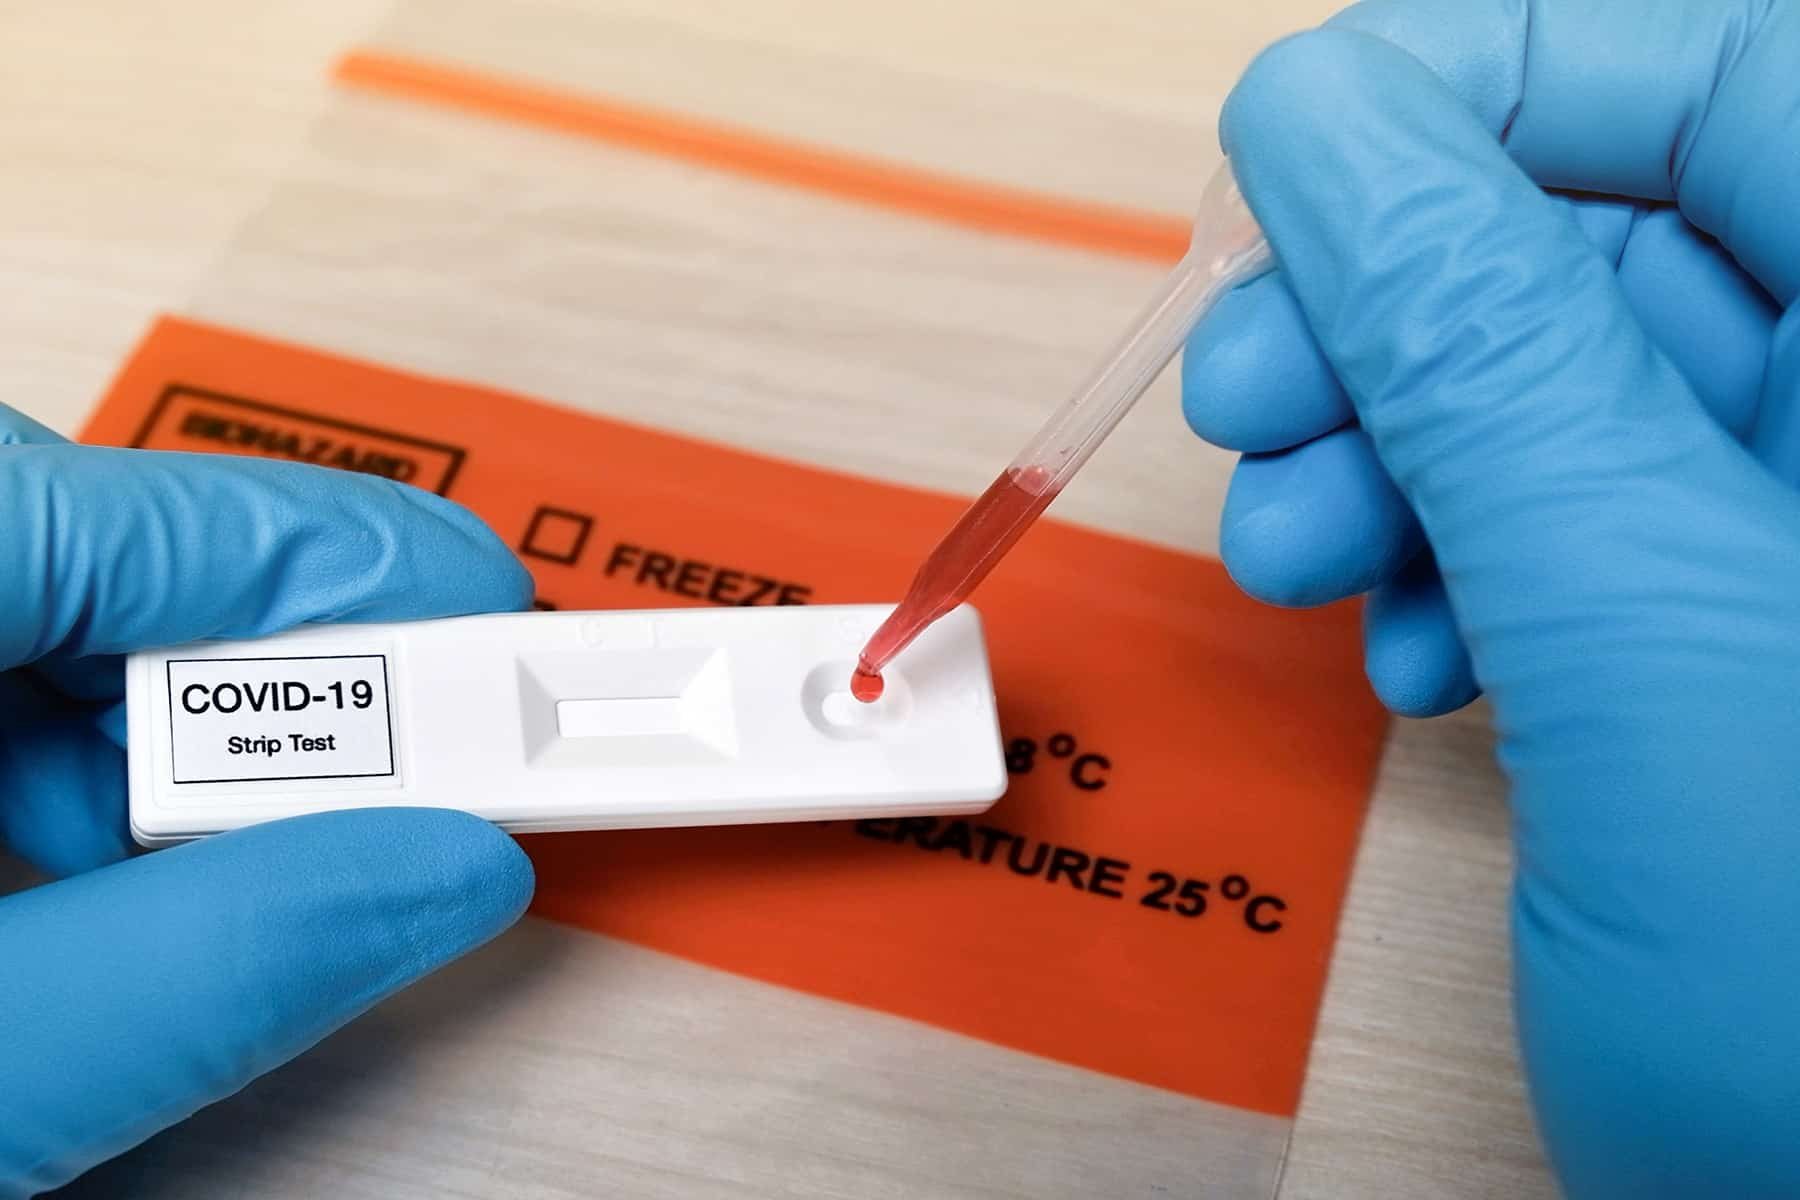 IISc develops new COVID-19 antibody test machine